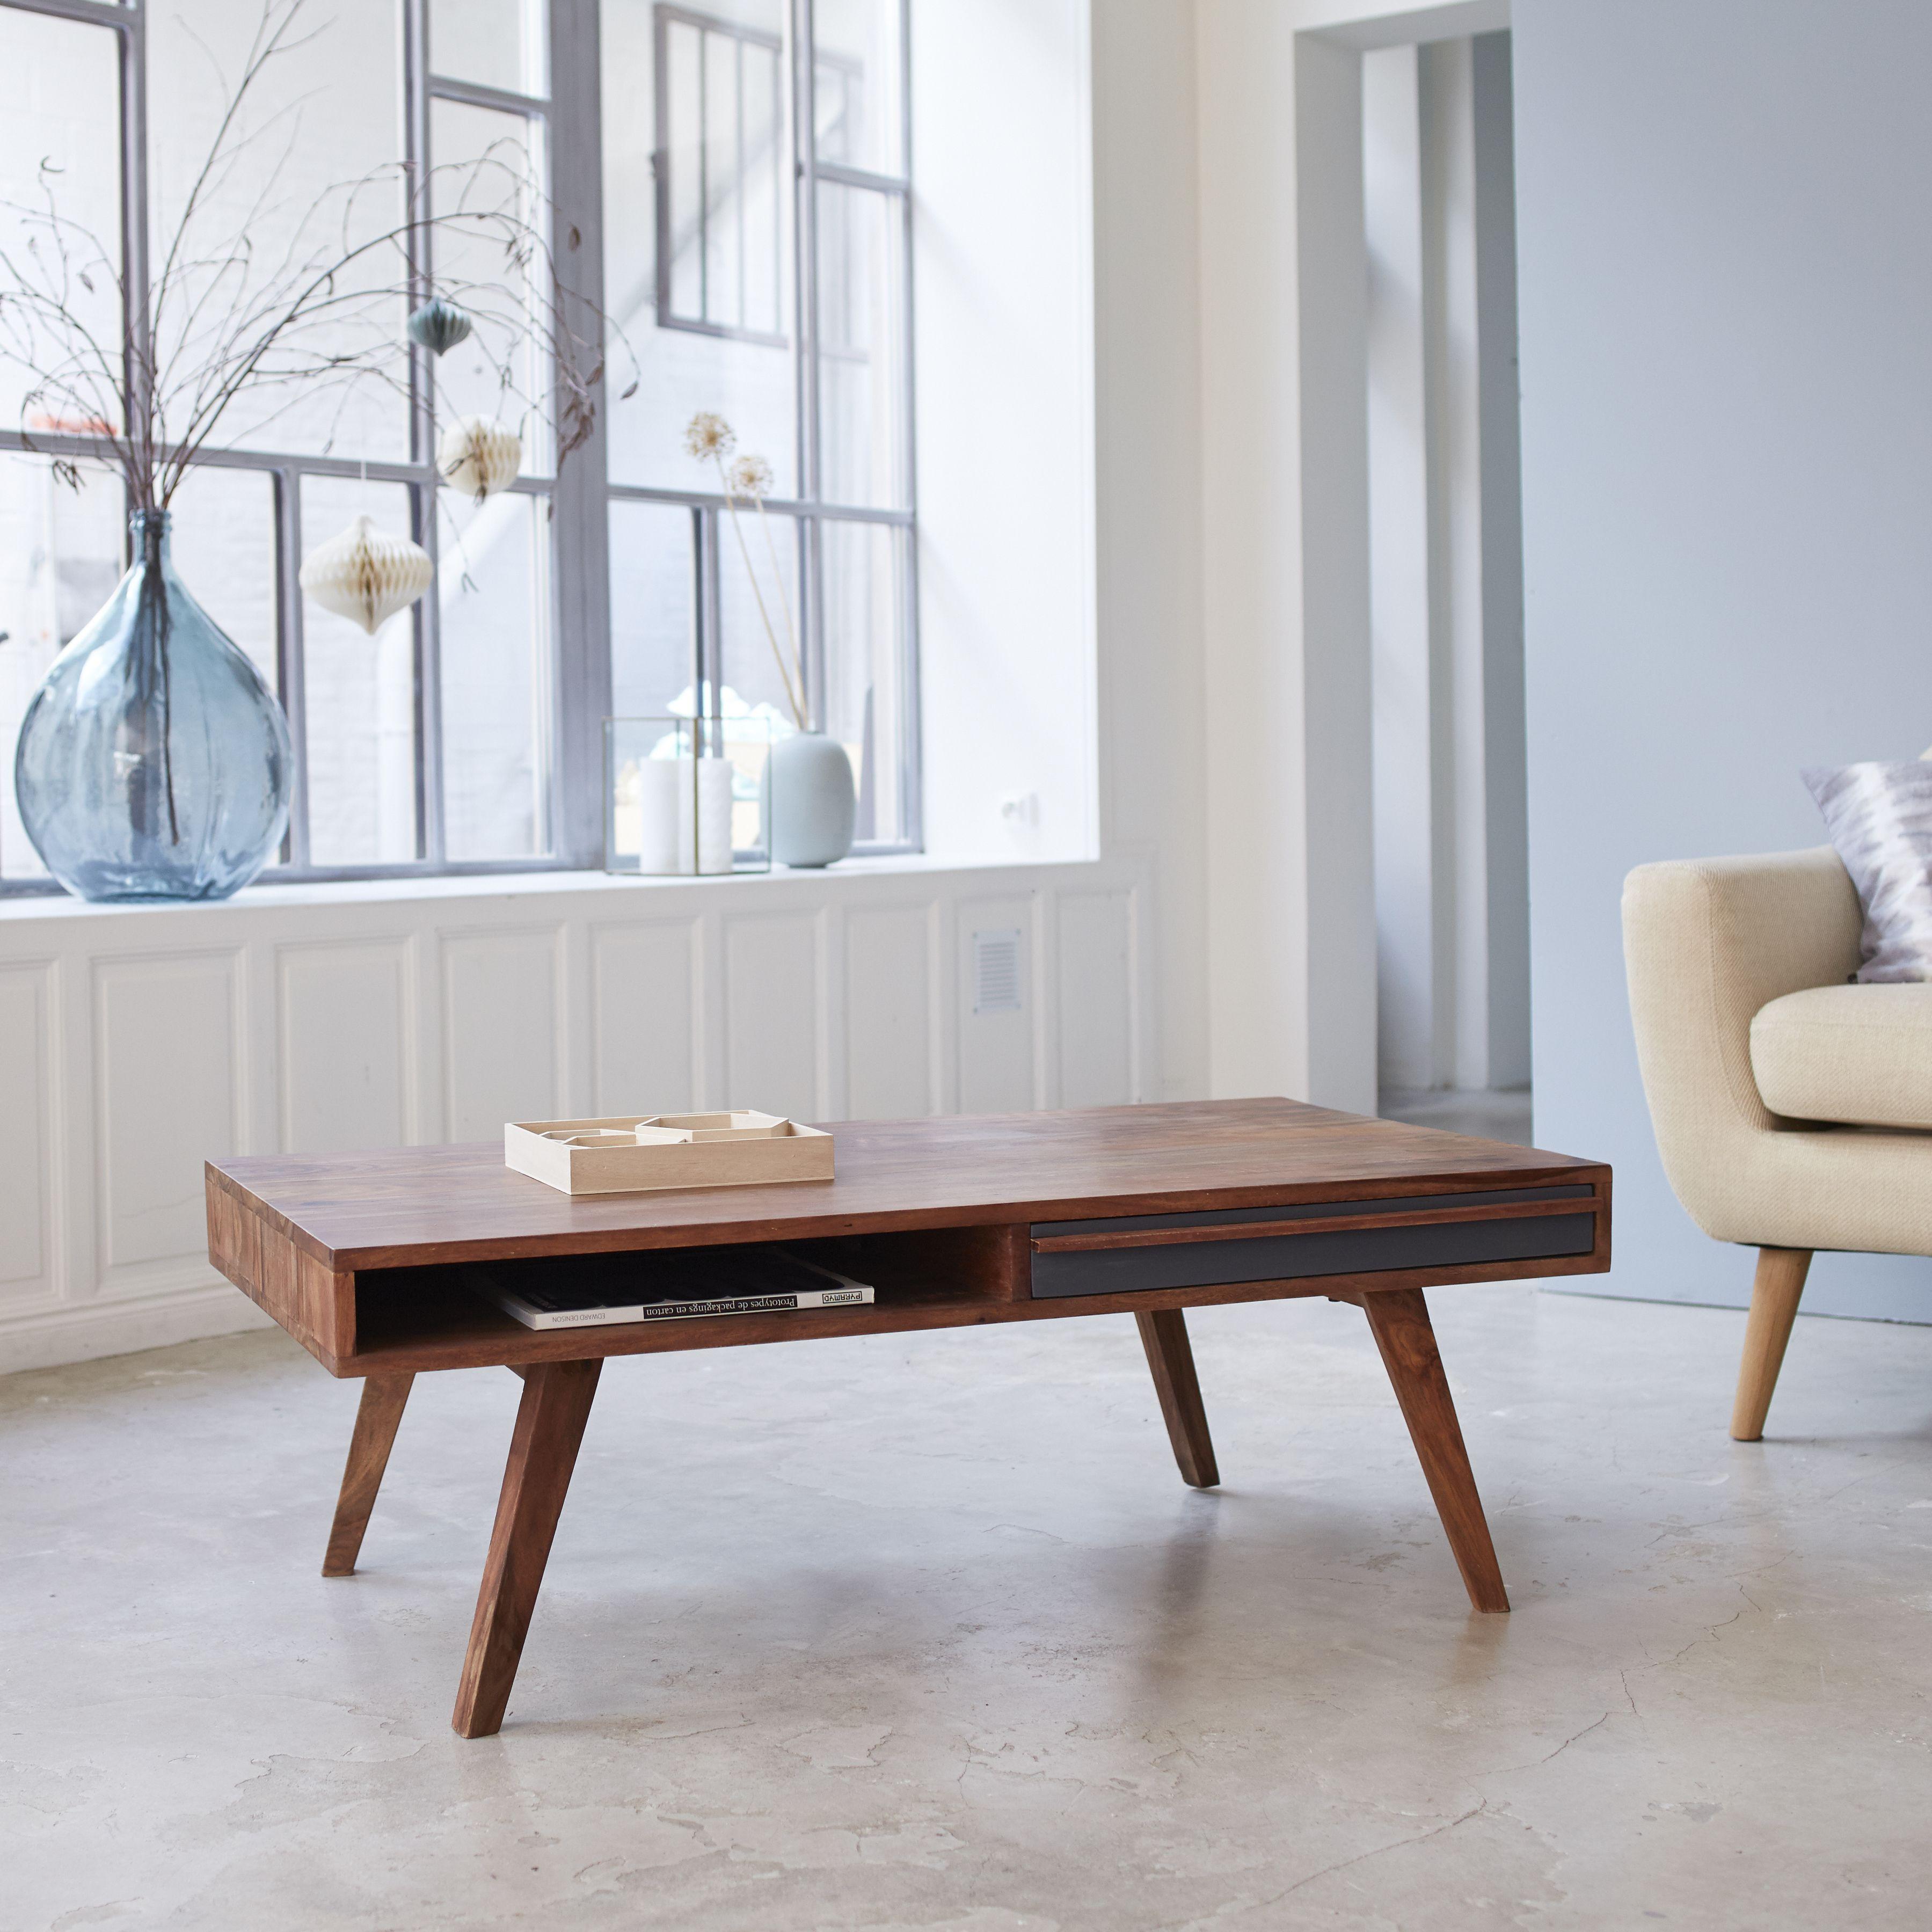 Table Basse En Palissandre 115 X 60 Cm Meubles Pour Salon Tikamoon Coffee Table Coffee Table Vintage Style Buy Coffee Table [ jpg ]